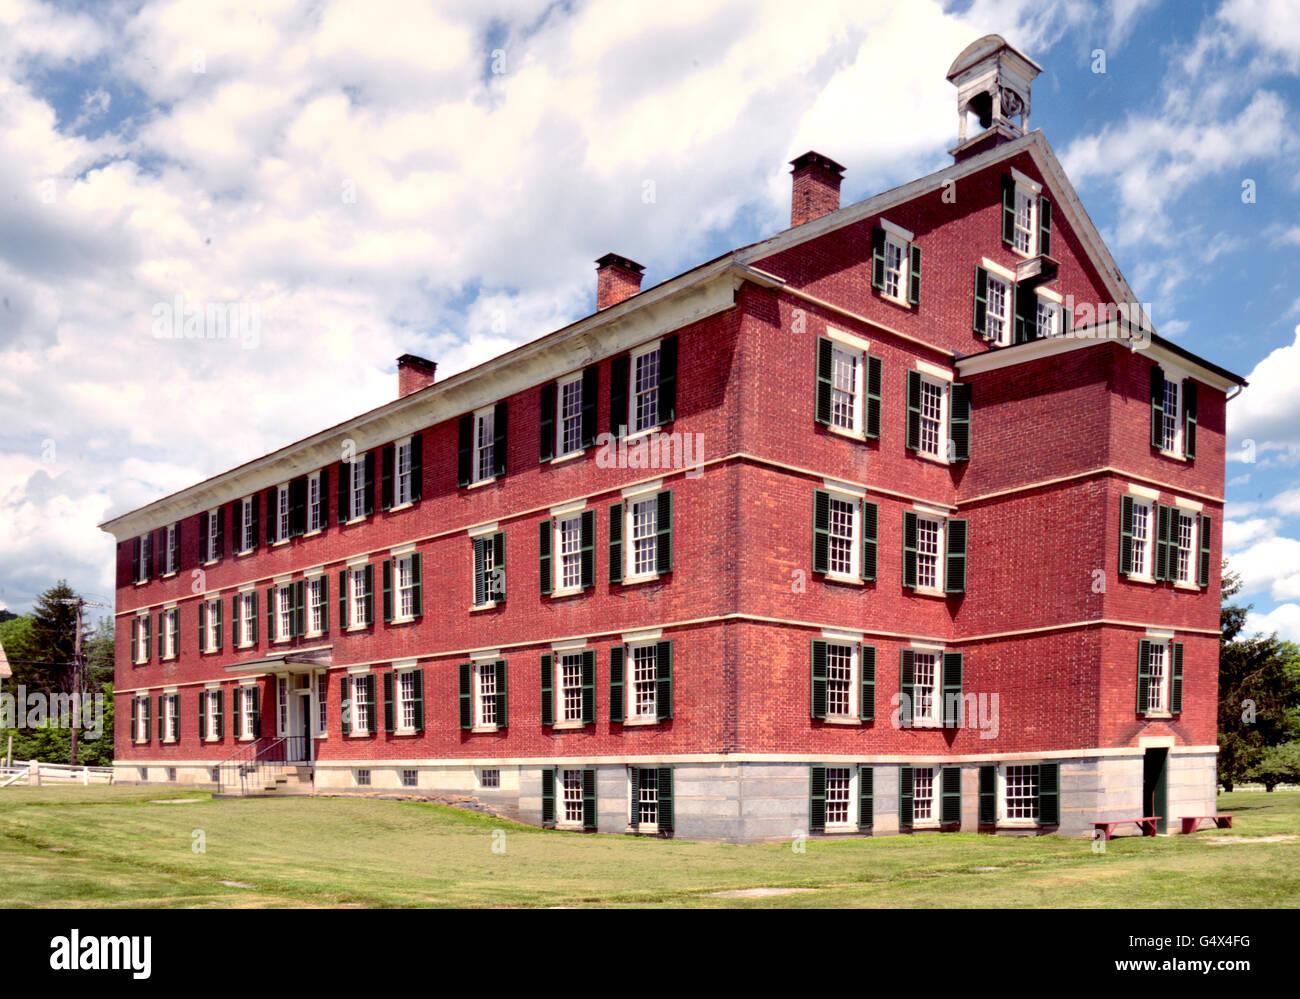 Communal Housing, Hancock Shaker Village, Massachusetts - Stock Image